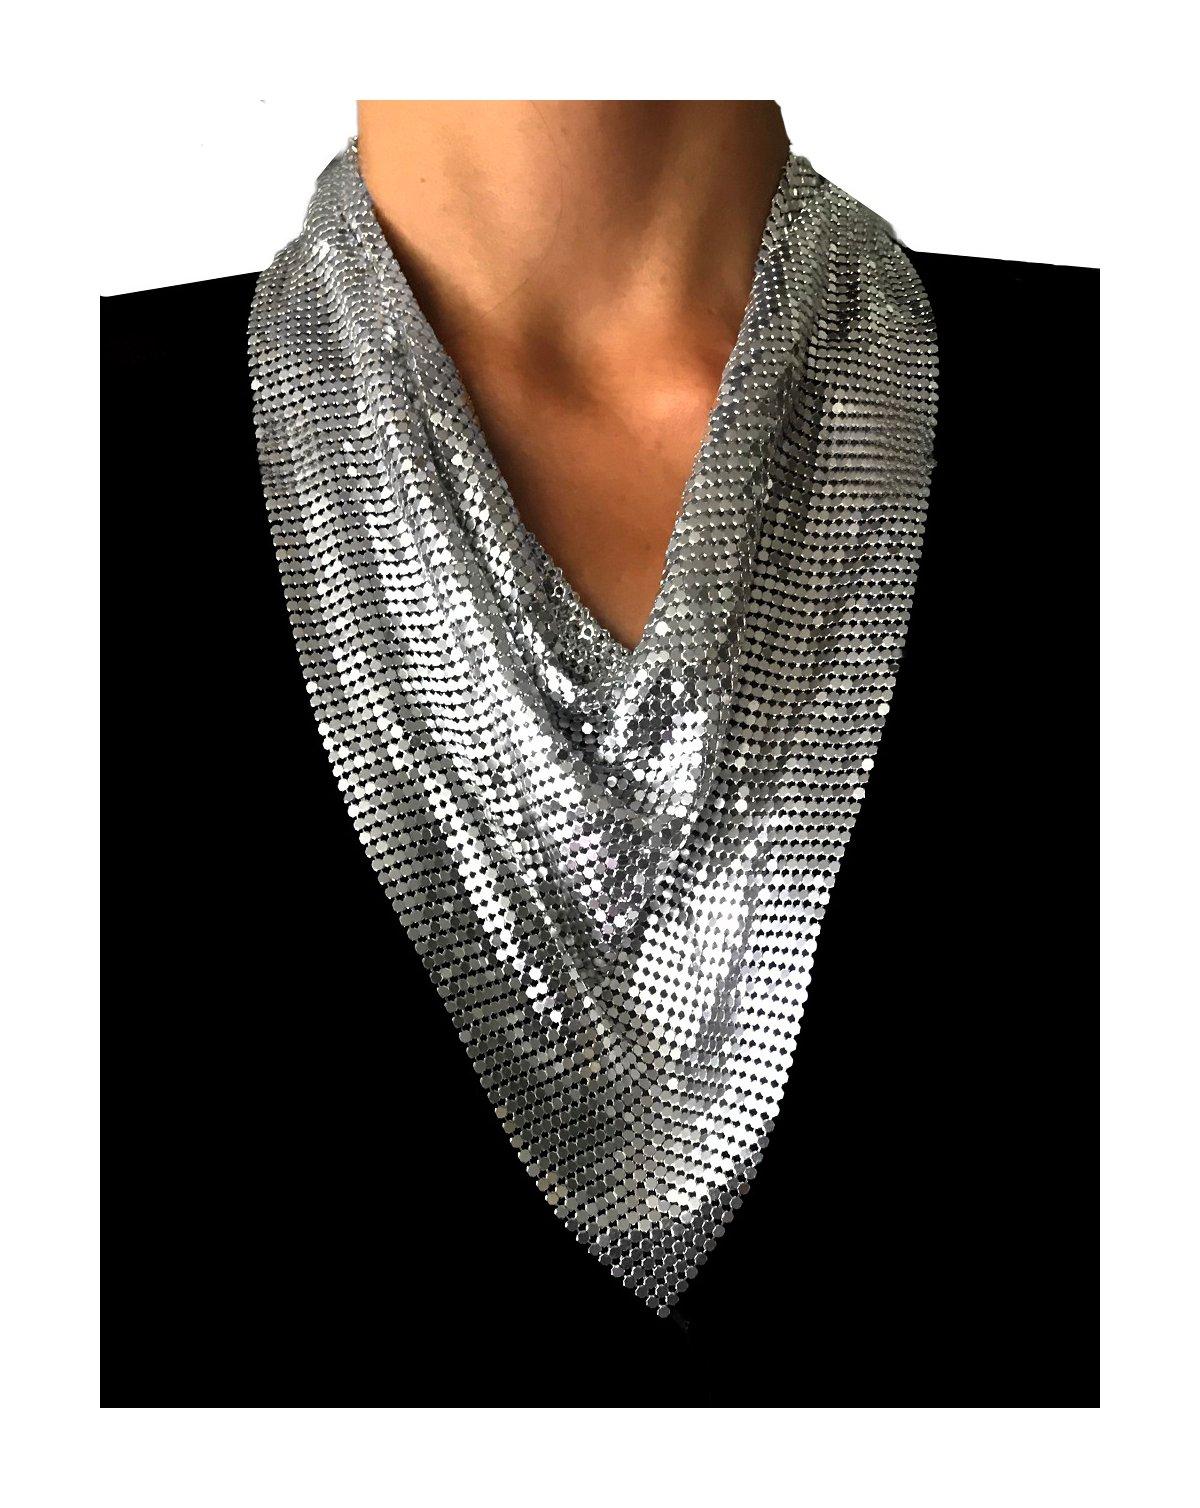 Nataliya Short Collar Statement Necklace (metal mesh scarf silver collar)